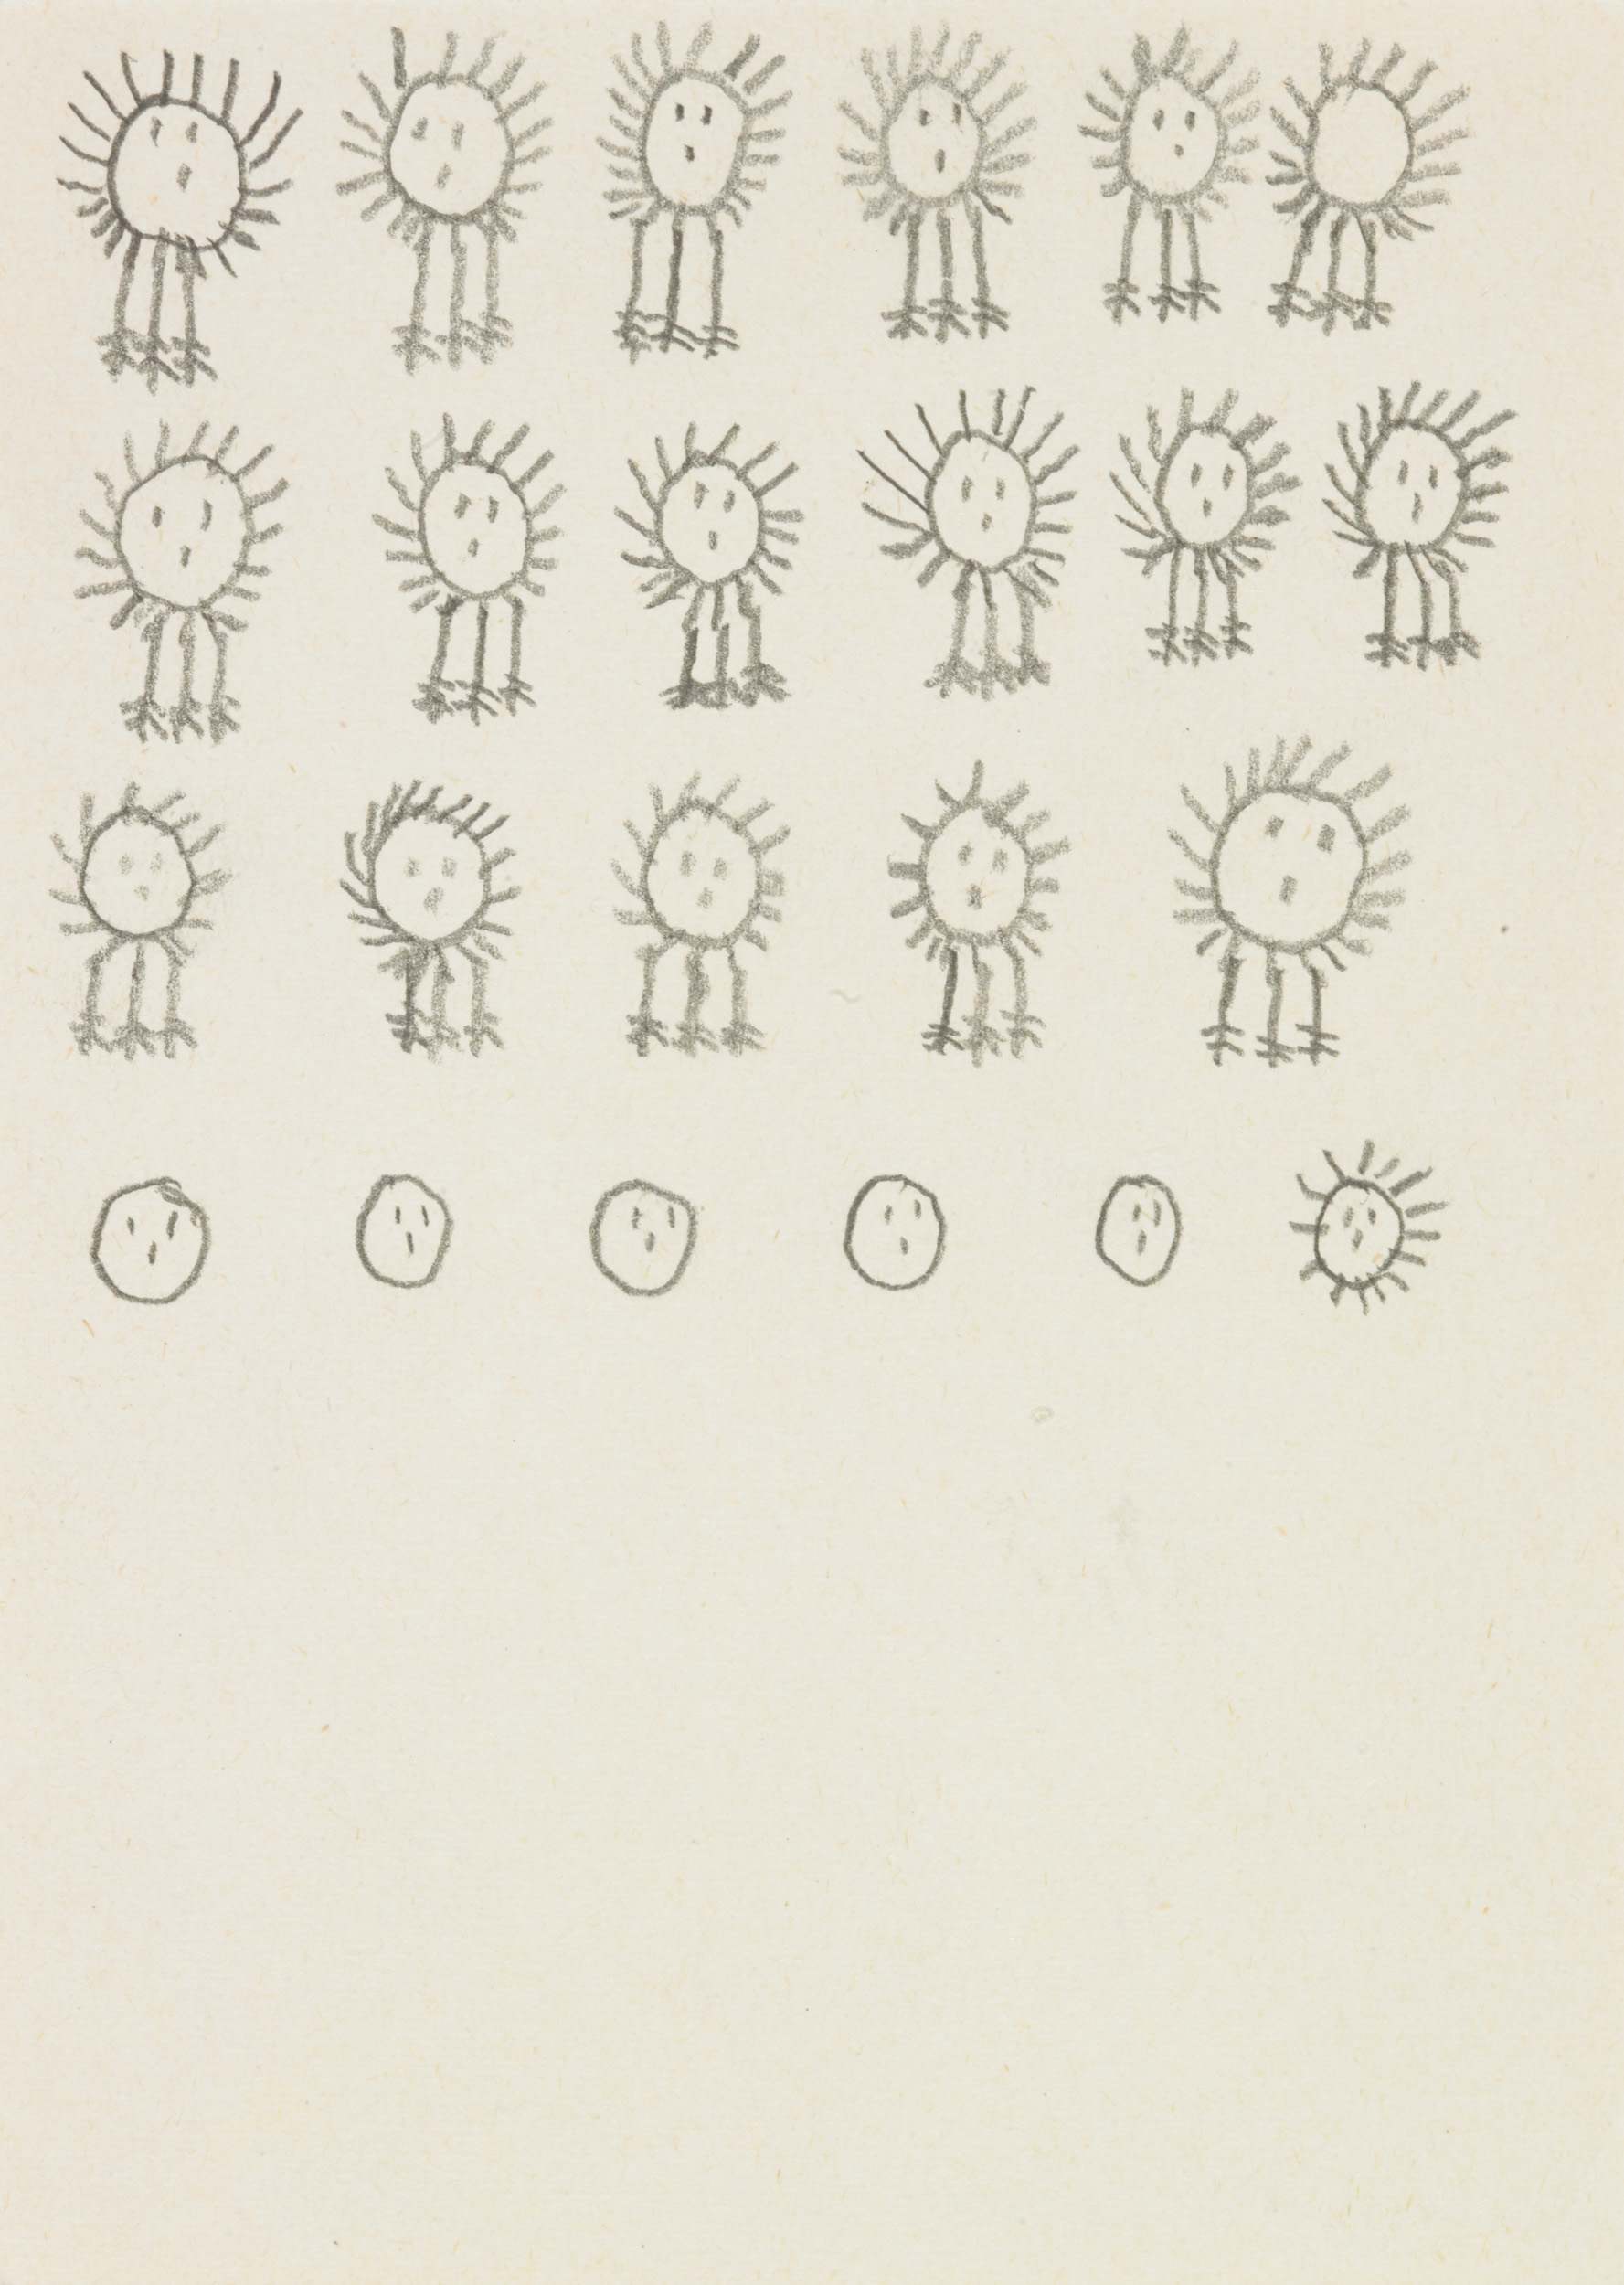 rosskopf karoline - Menschen / Humans